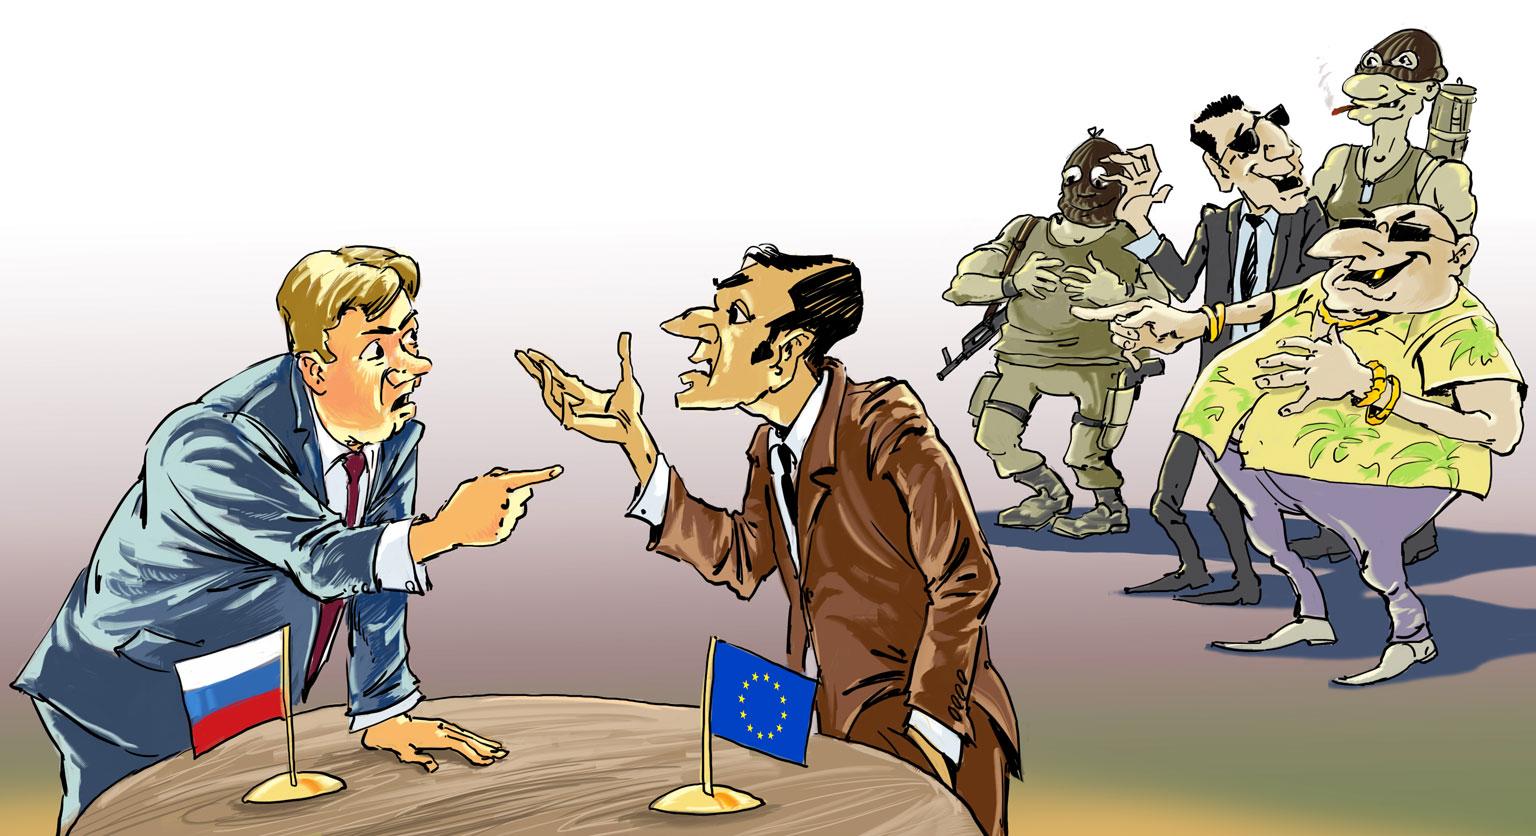 Rusia dan Barat, Dunia Memasuki Zaman Multipolaritas Praktis